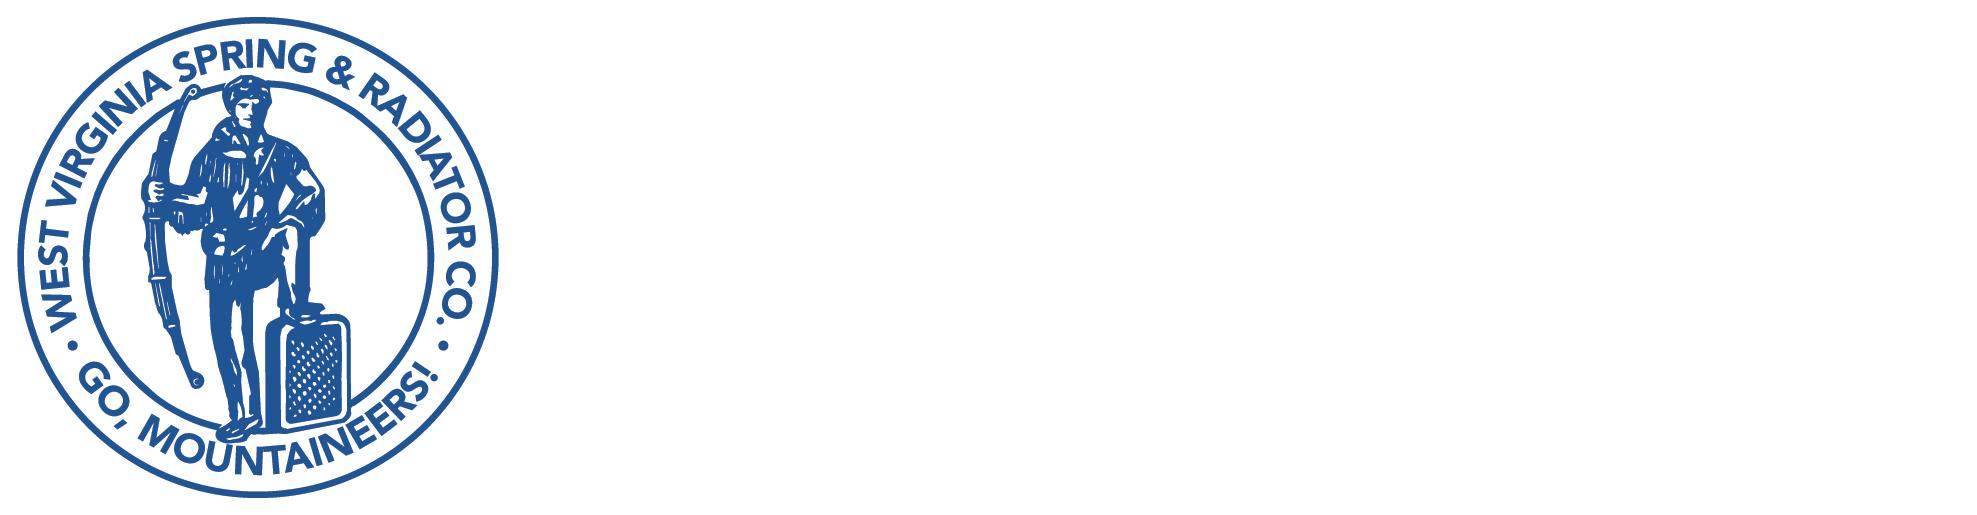 WEST VIRGINIA SPRING & RADIATOR CO